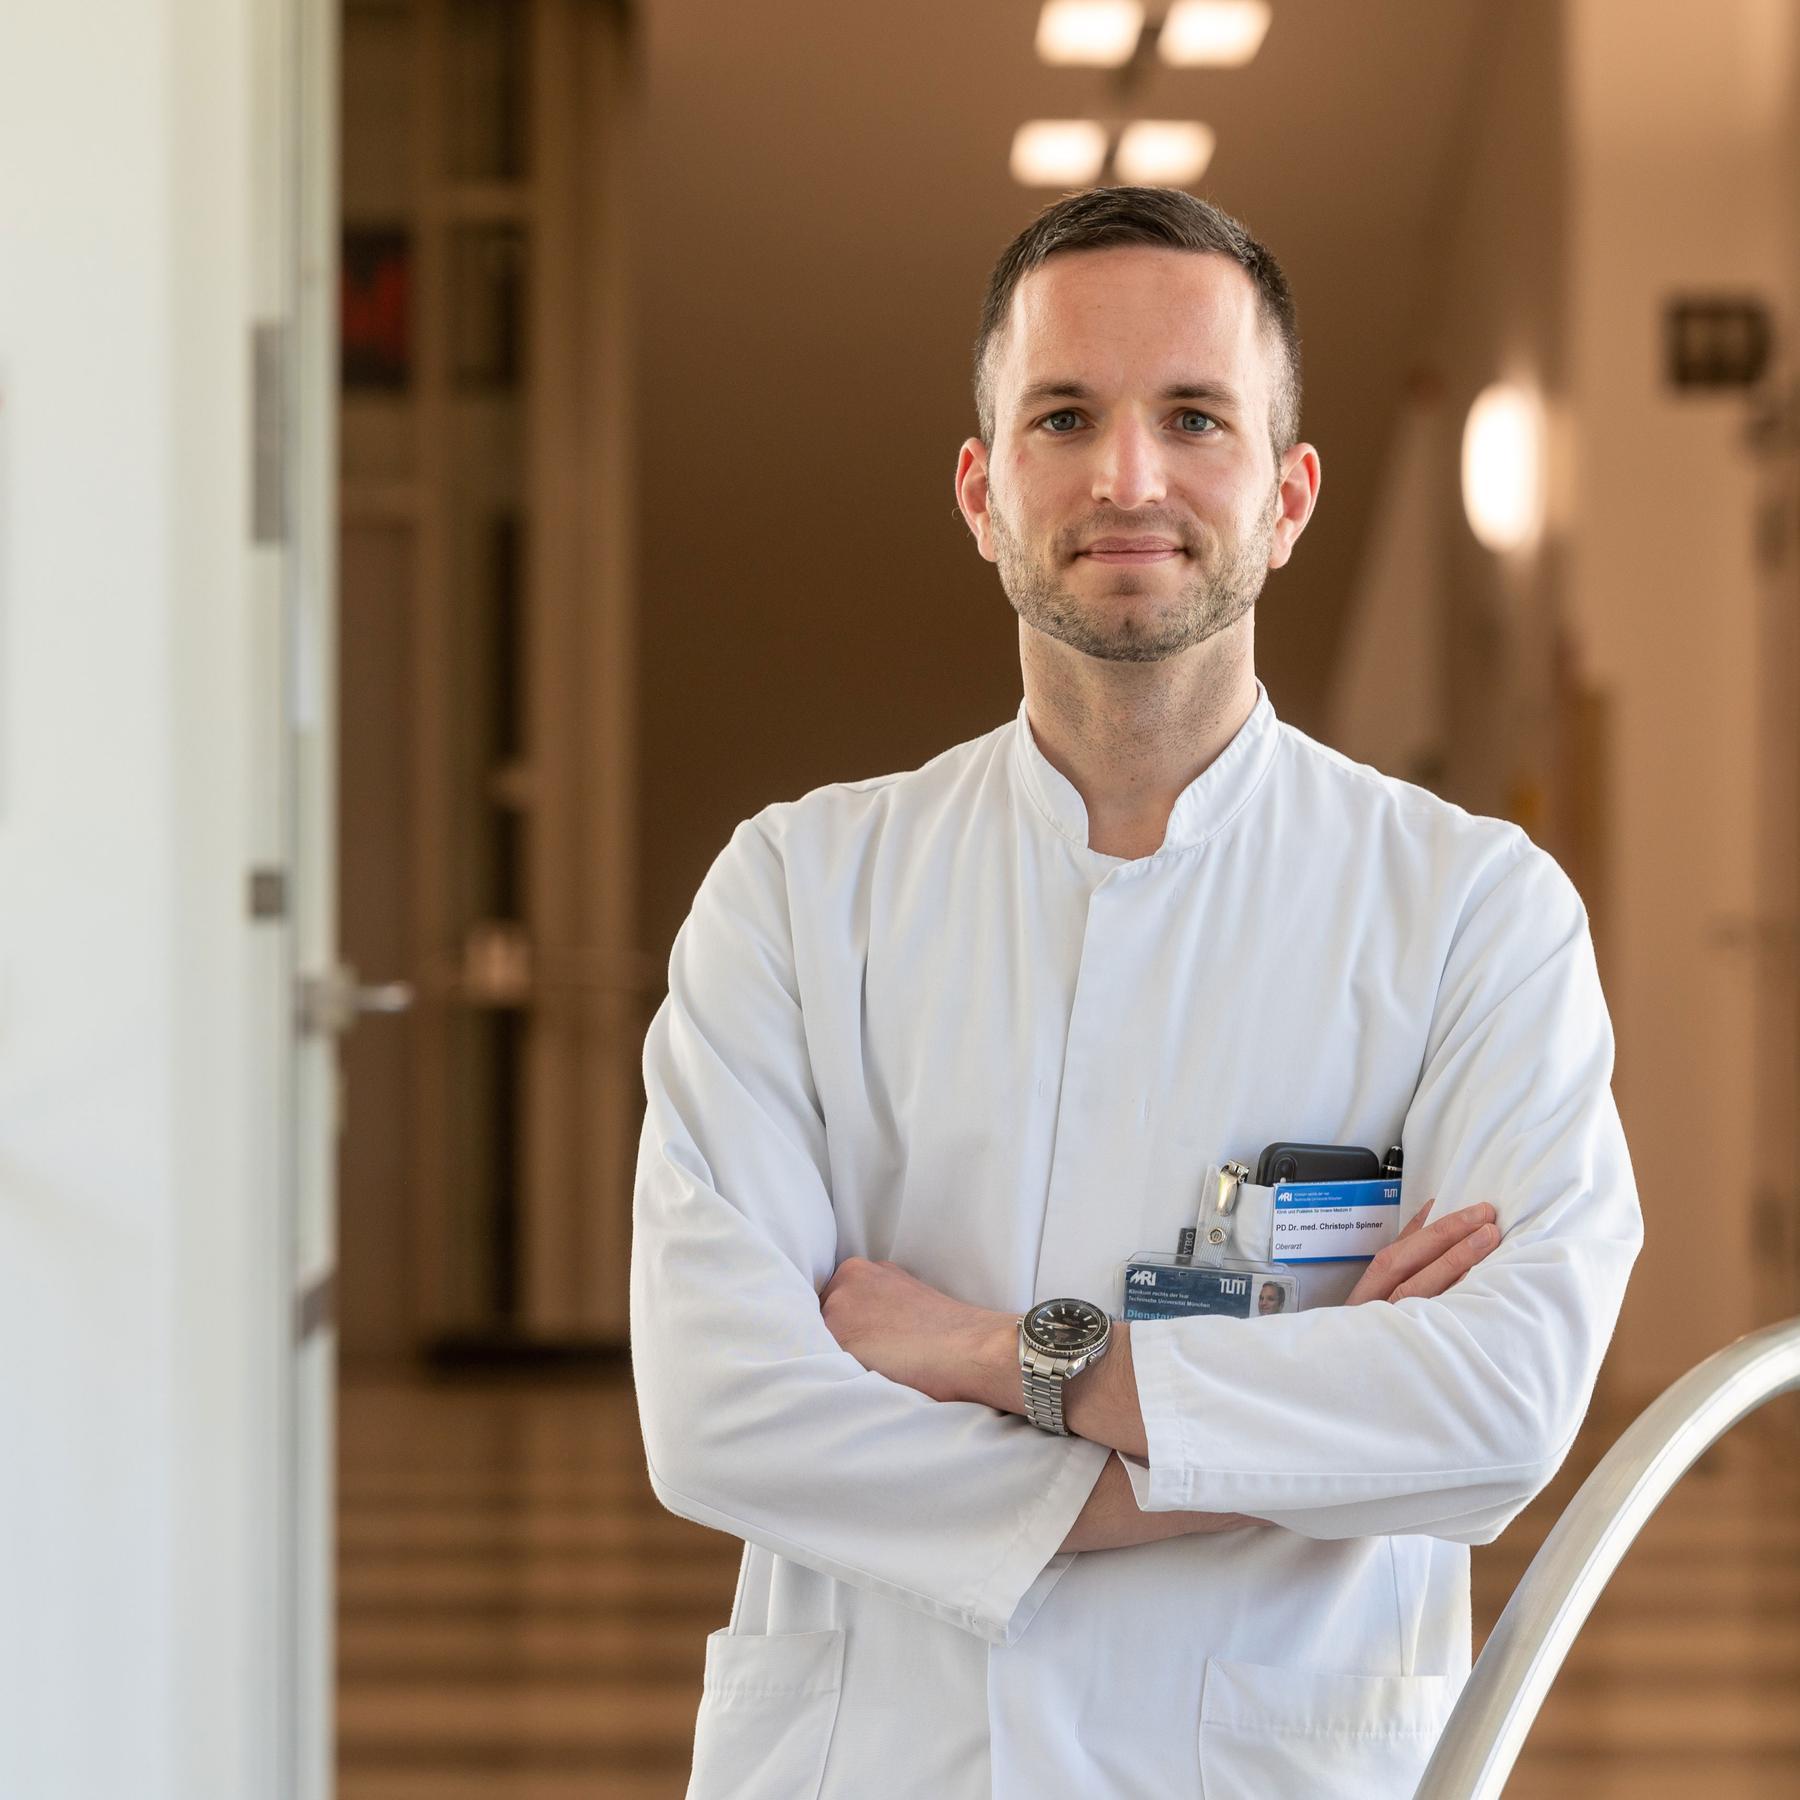 Corona-News mit Dr. Christoph Spinner (05.10.2021)